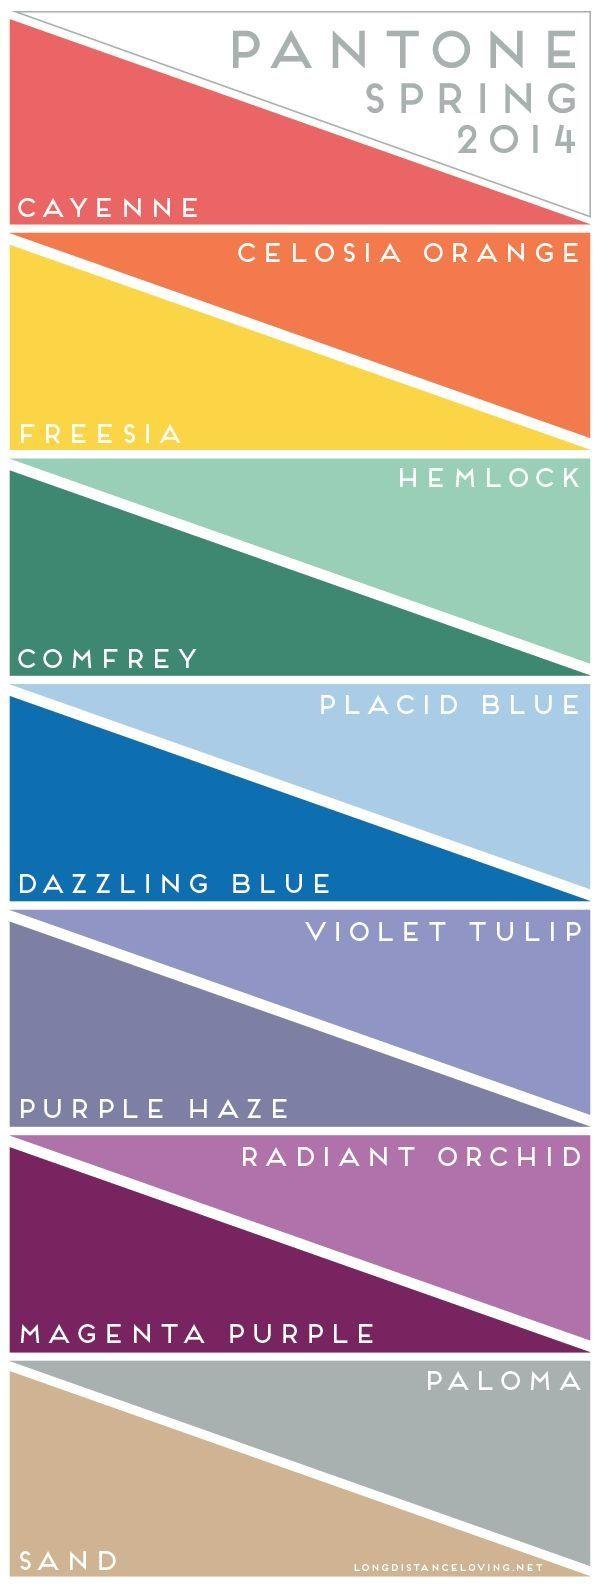 Pantone colors for 2014